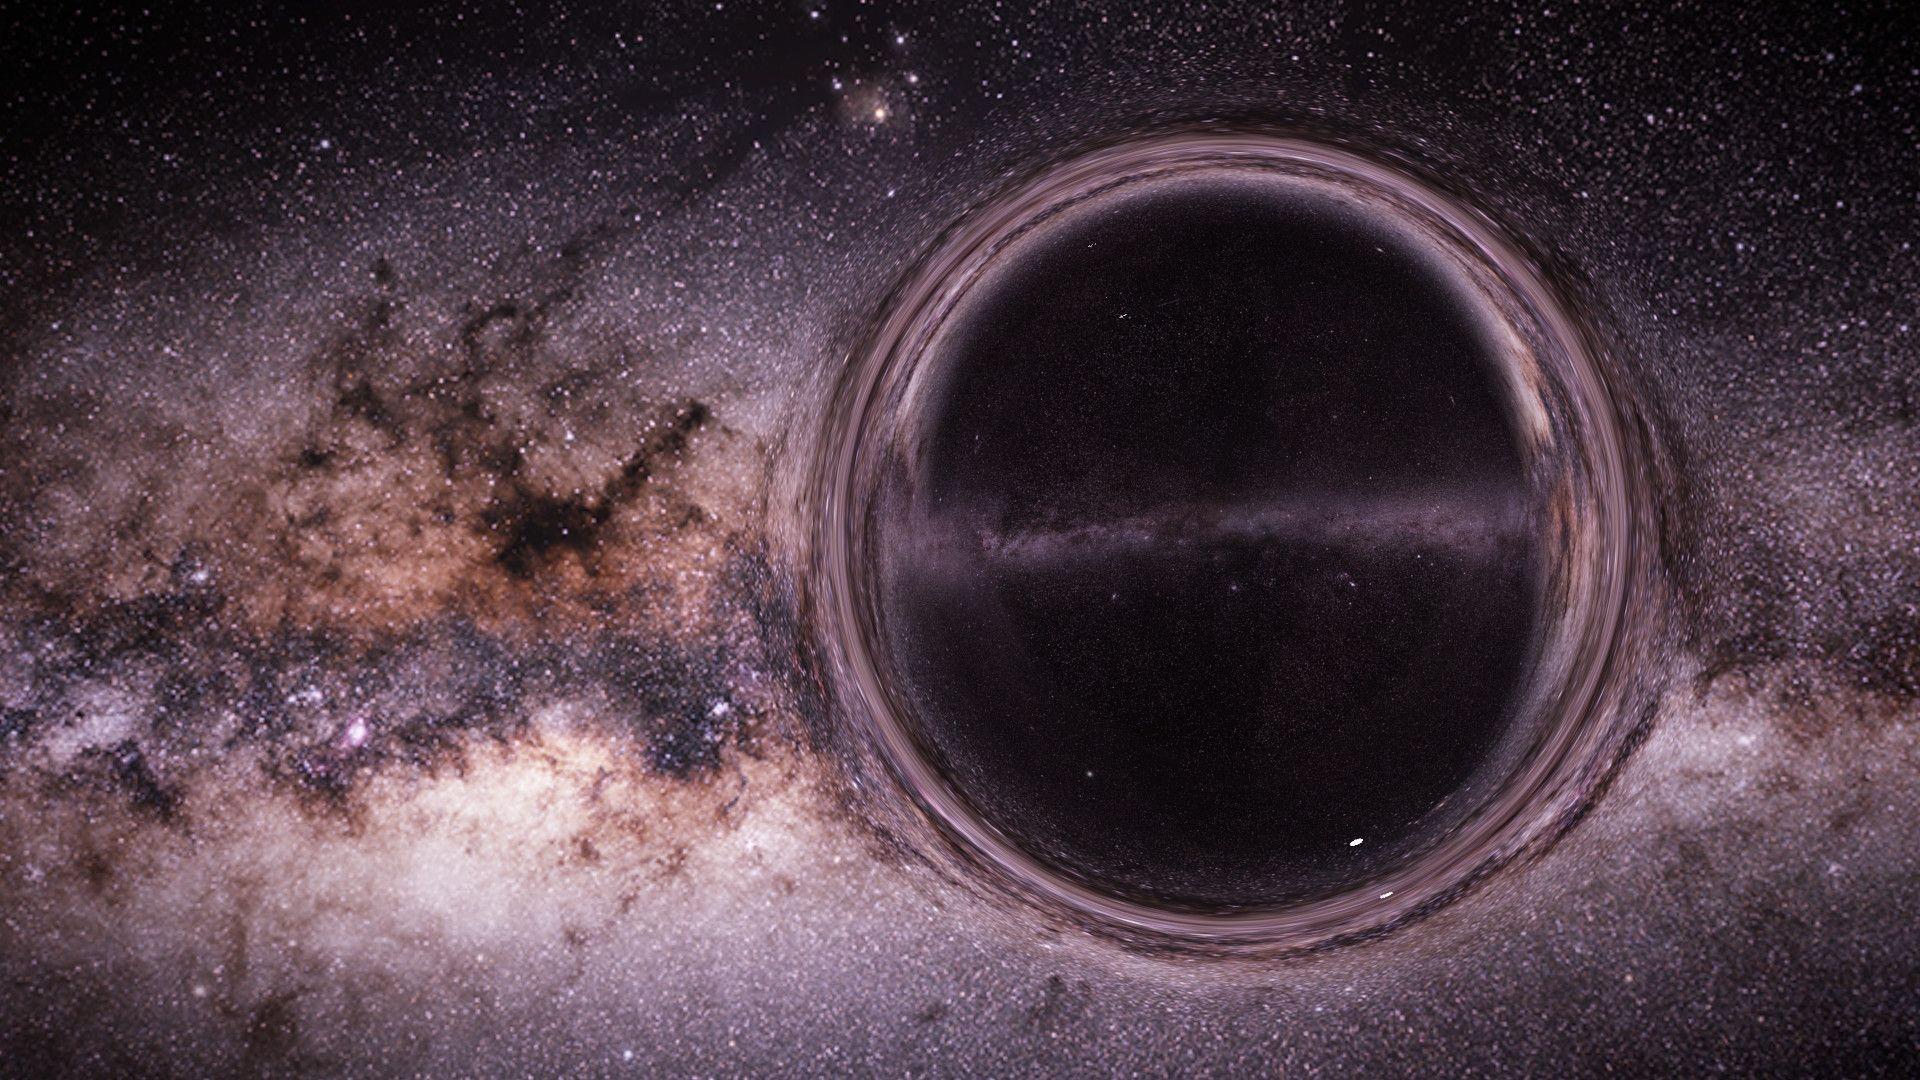 Black Hole, 1080p Wallpaper